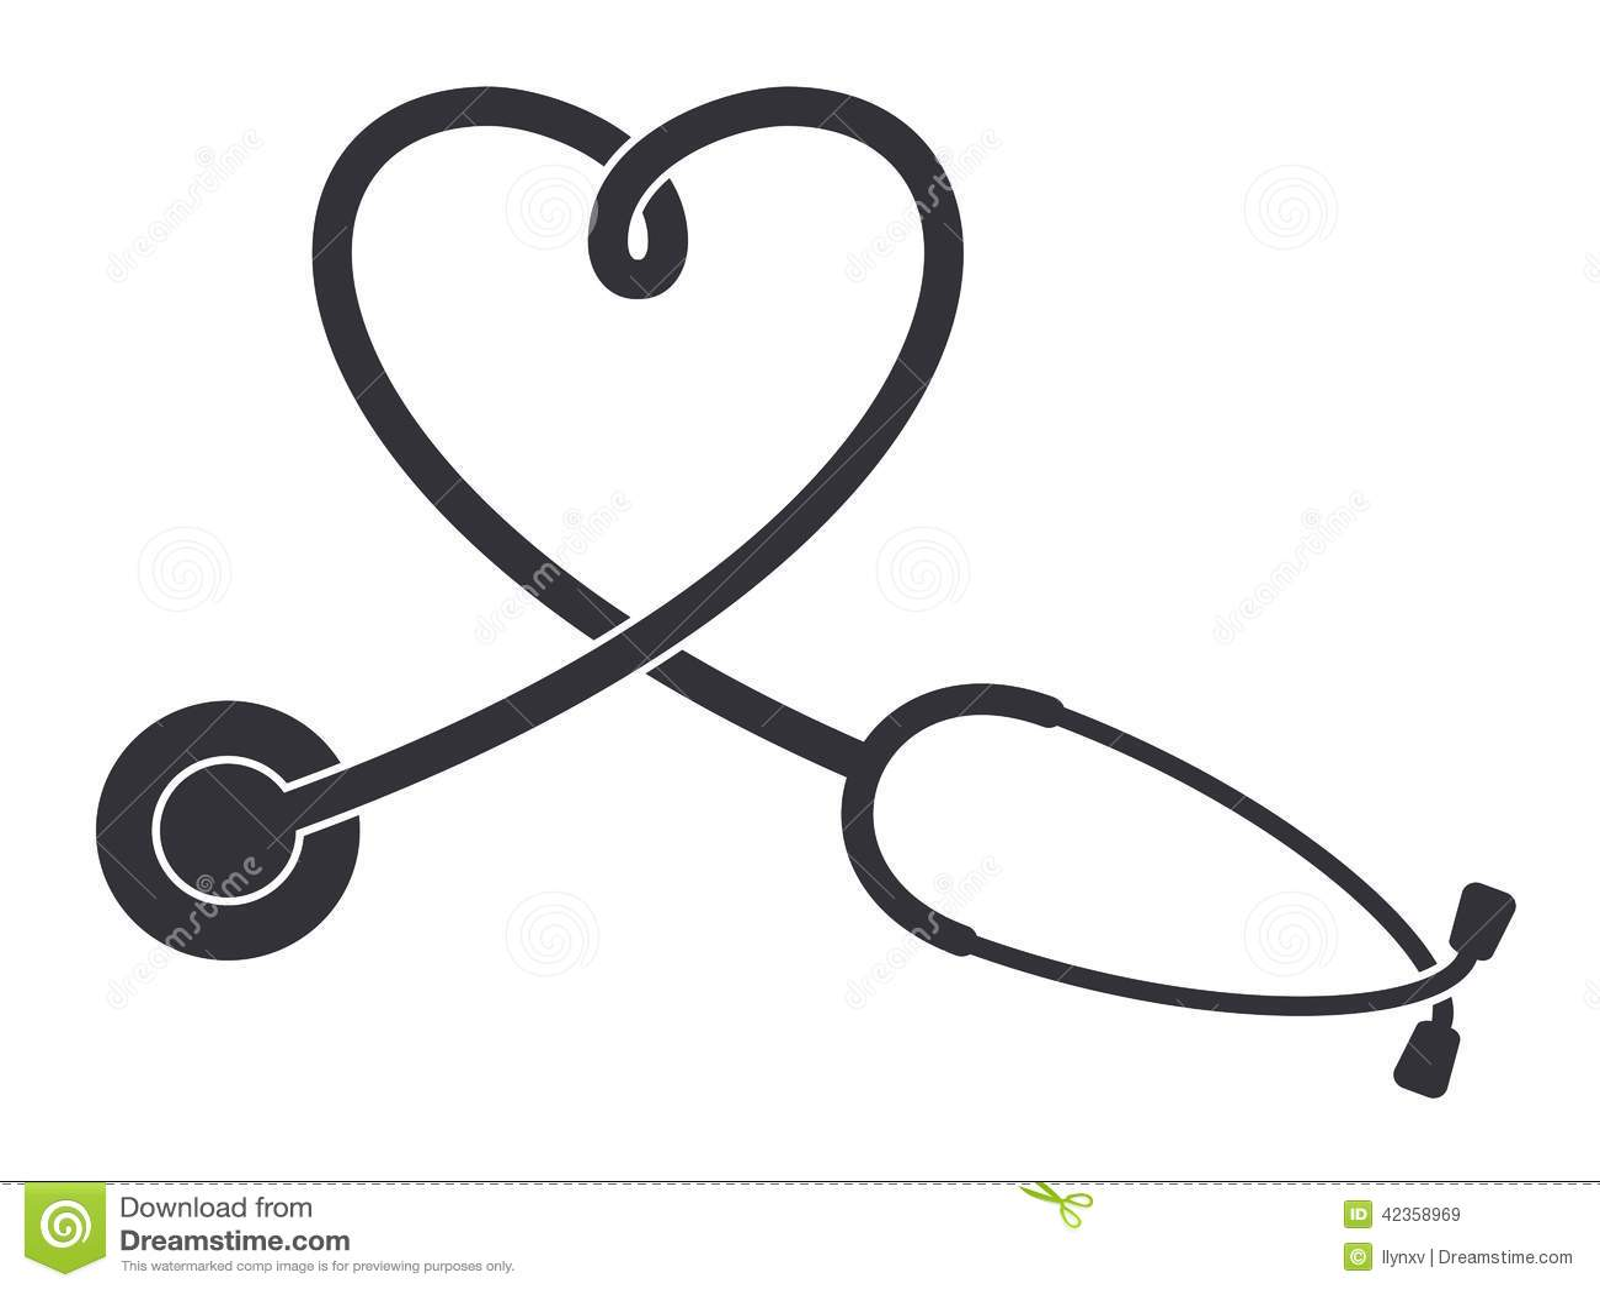 Nursing icons black and white stethoscope icon stock vector image